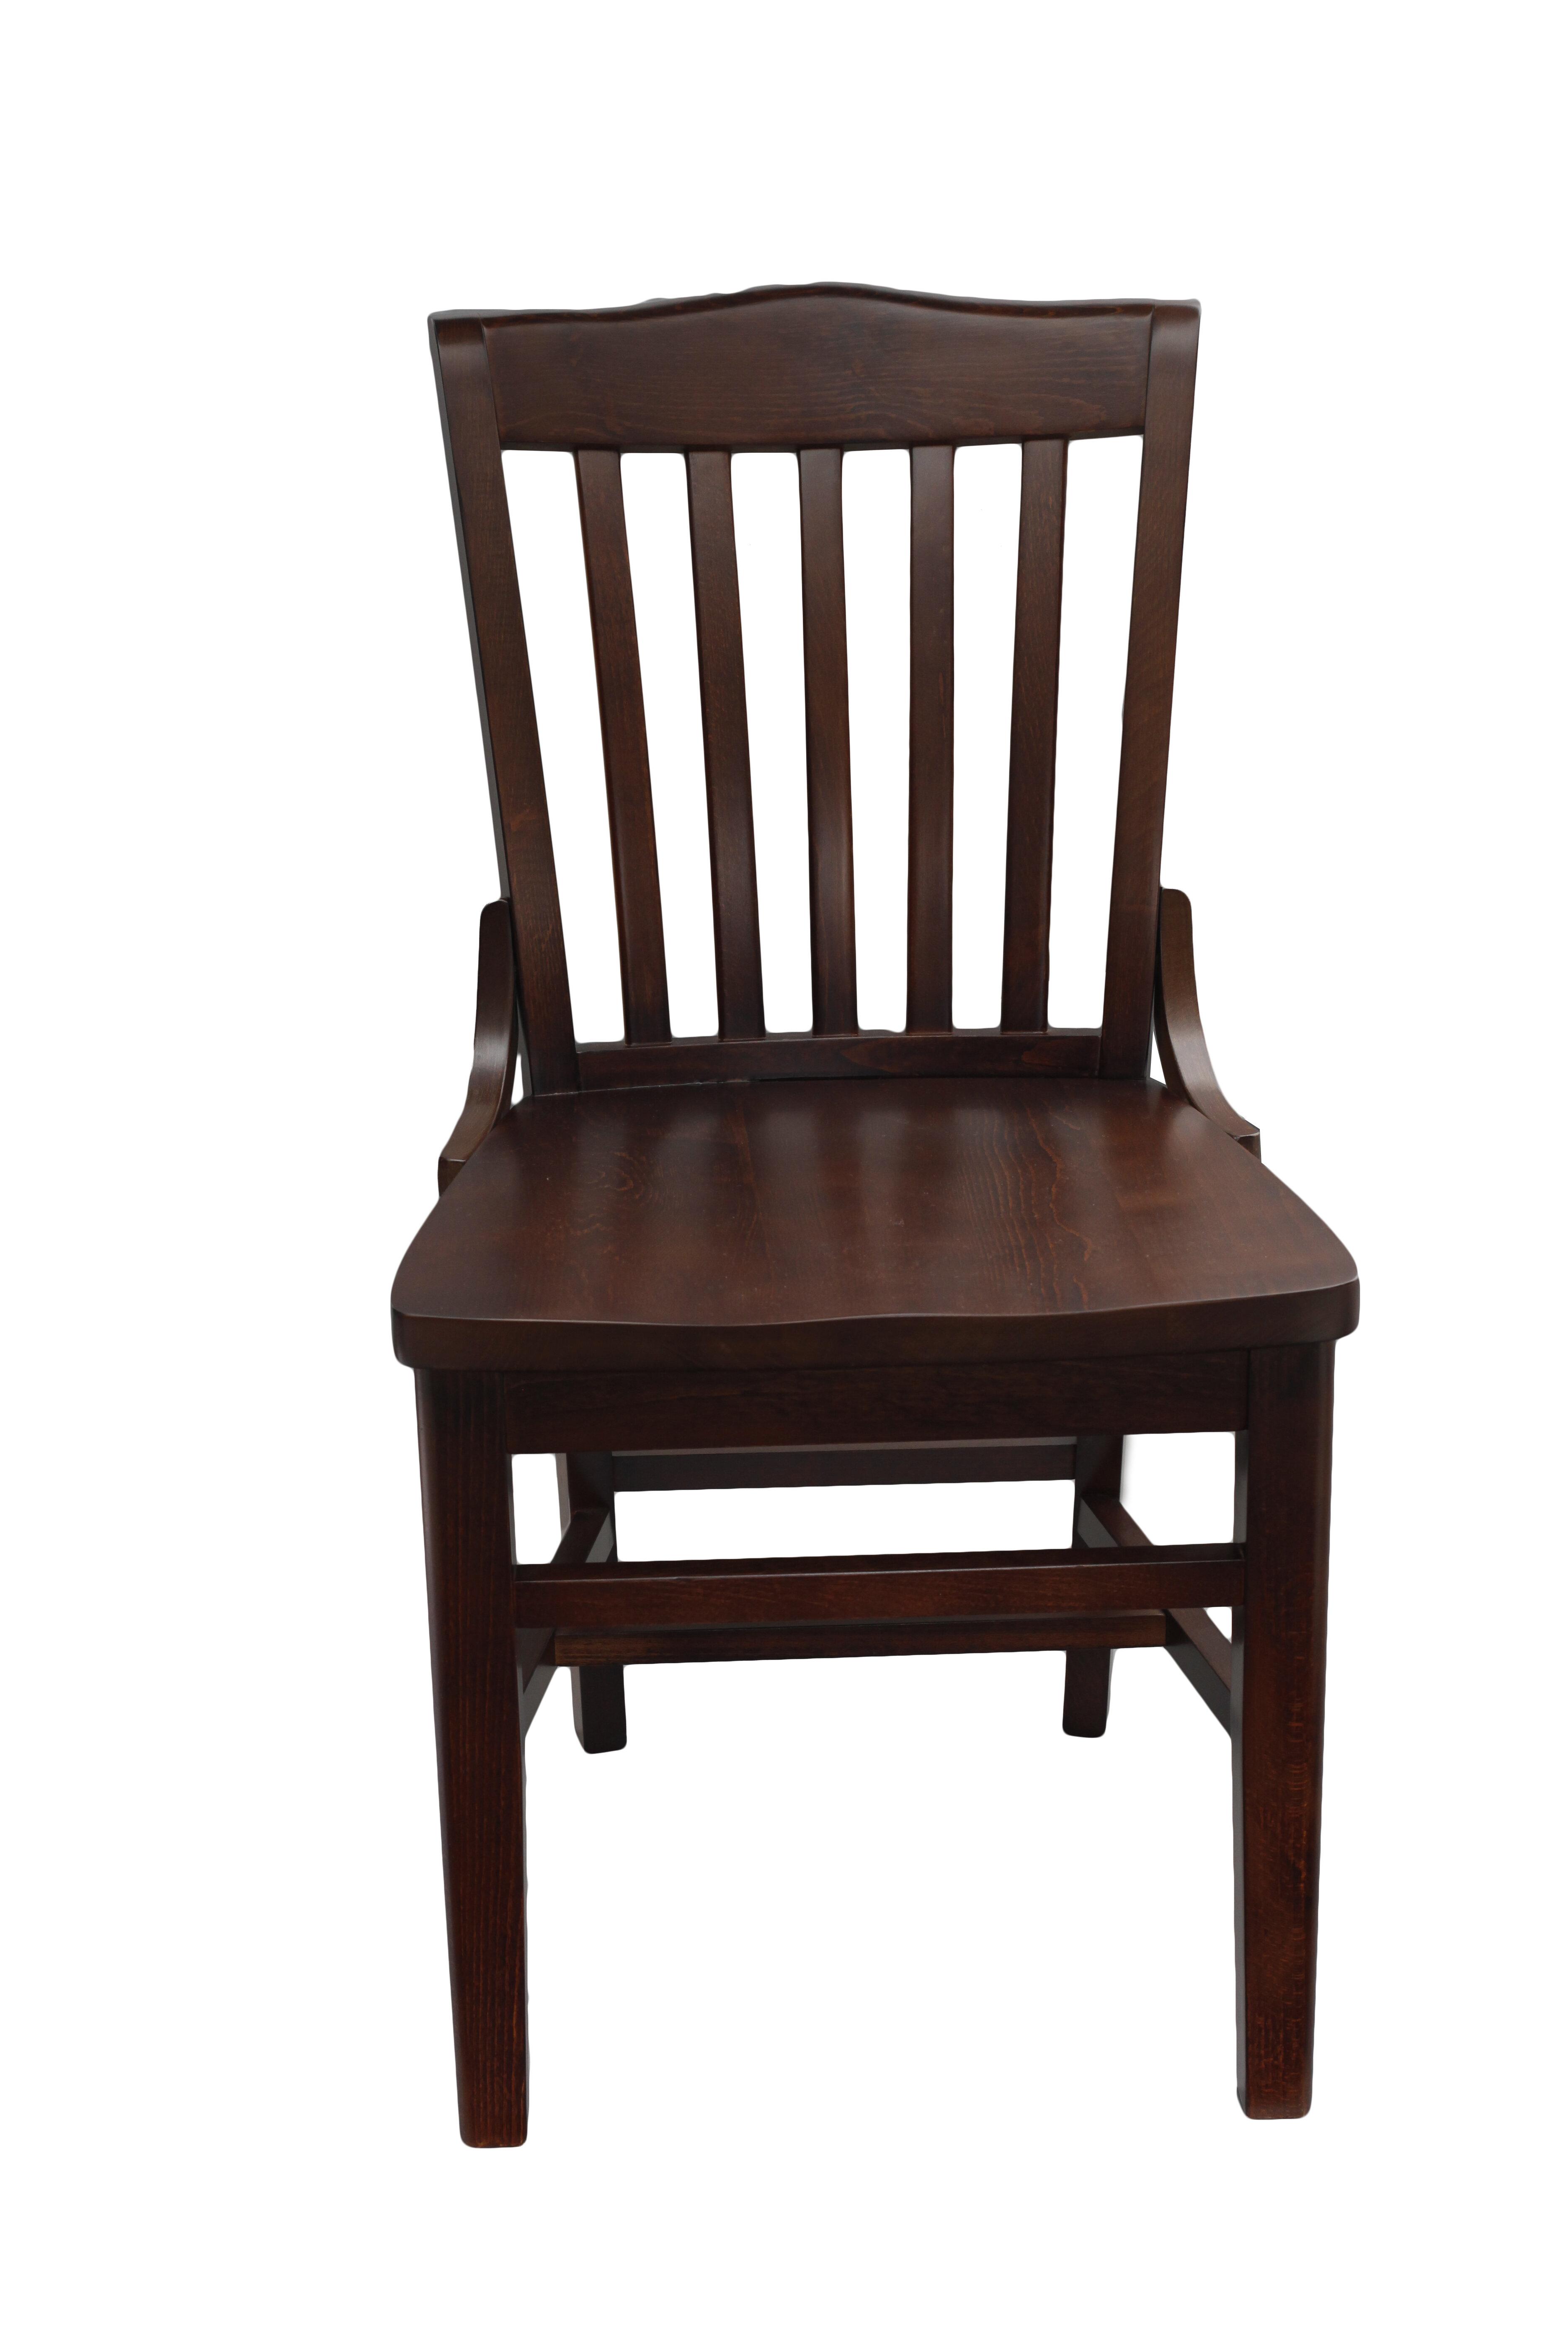 justchair schoolhouse solid wood dining chair reviews wayfair